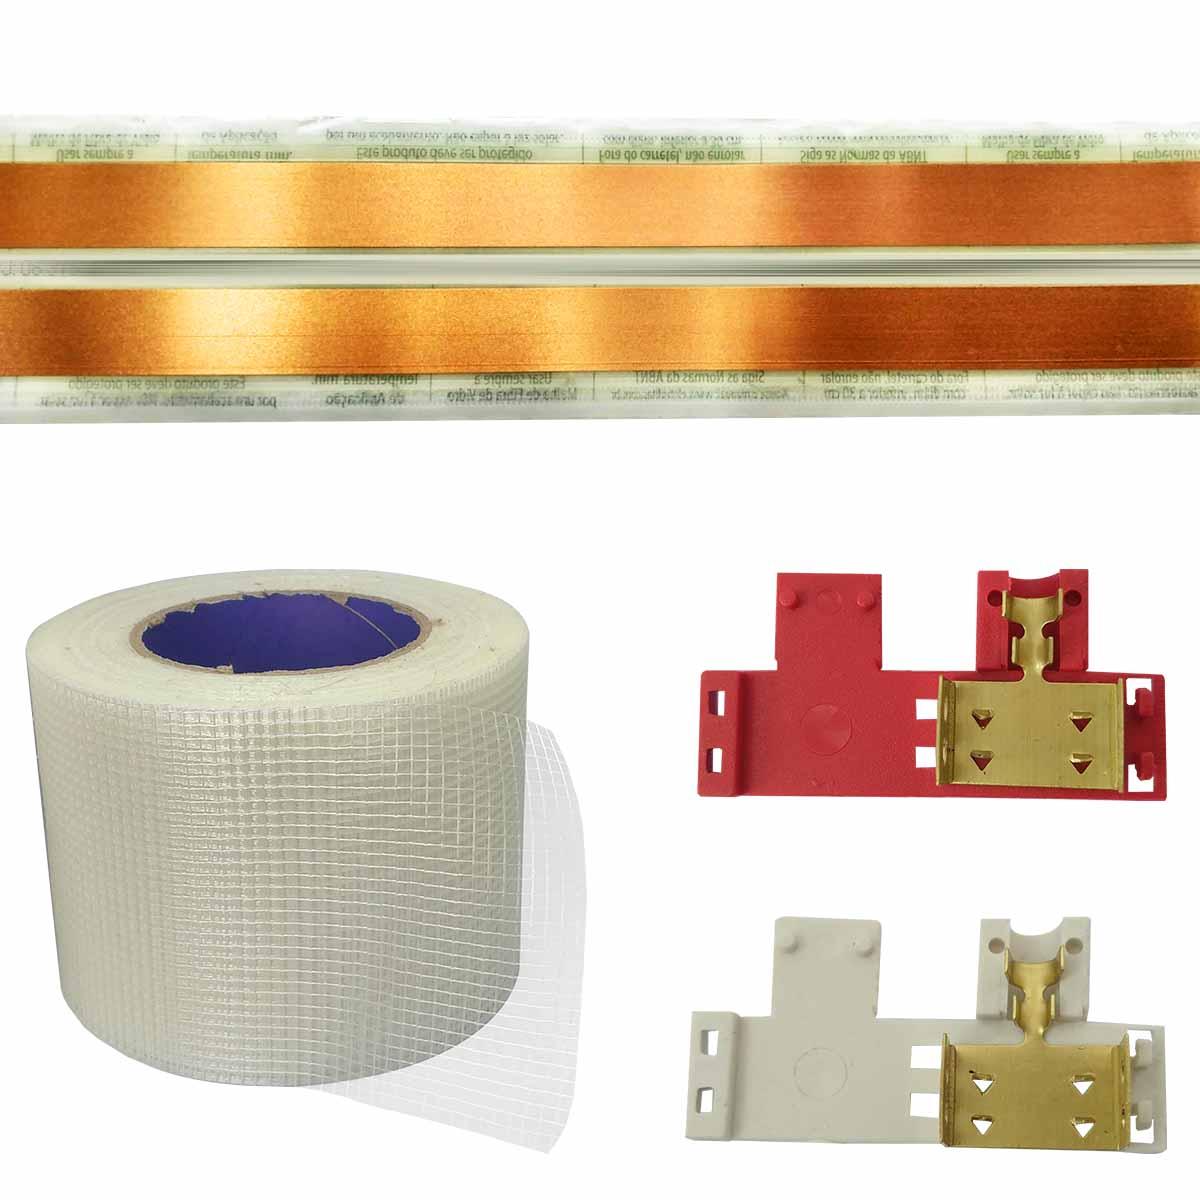 Kit Eletrofita 2 Pistas 1 Metro 750V 20A